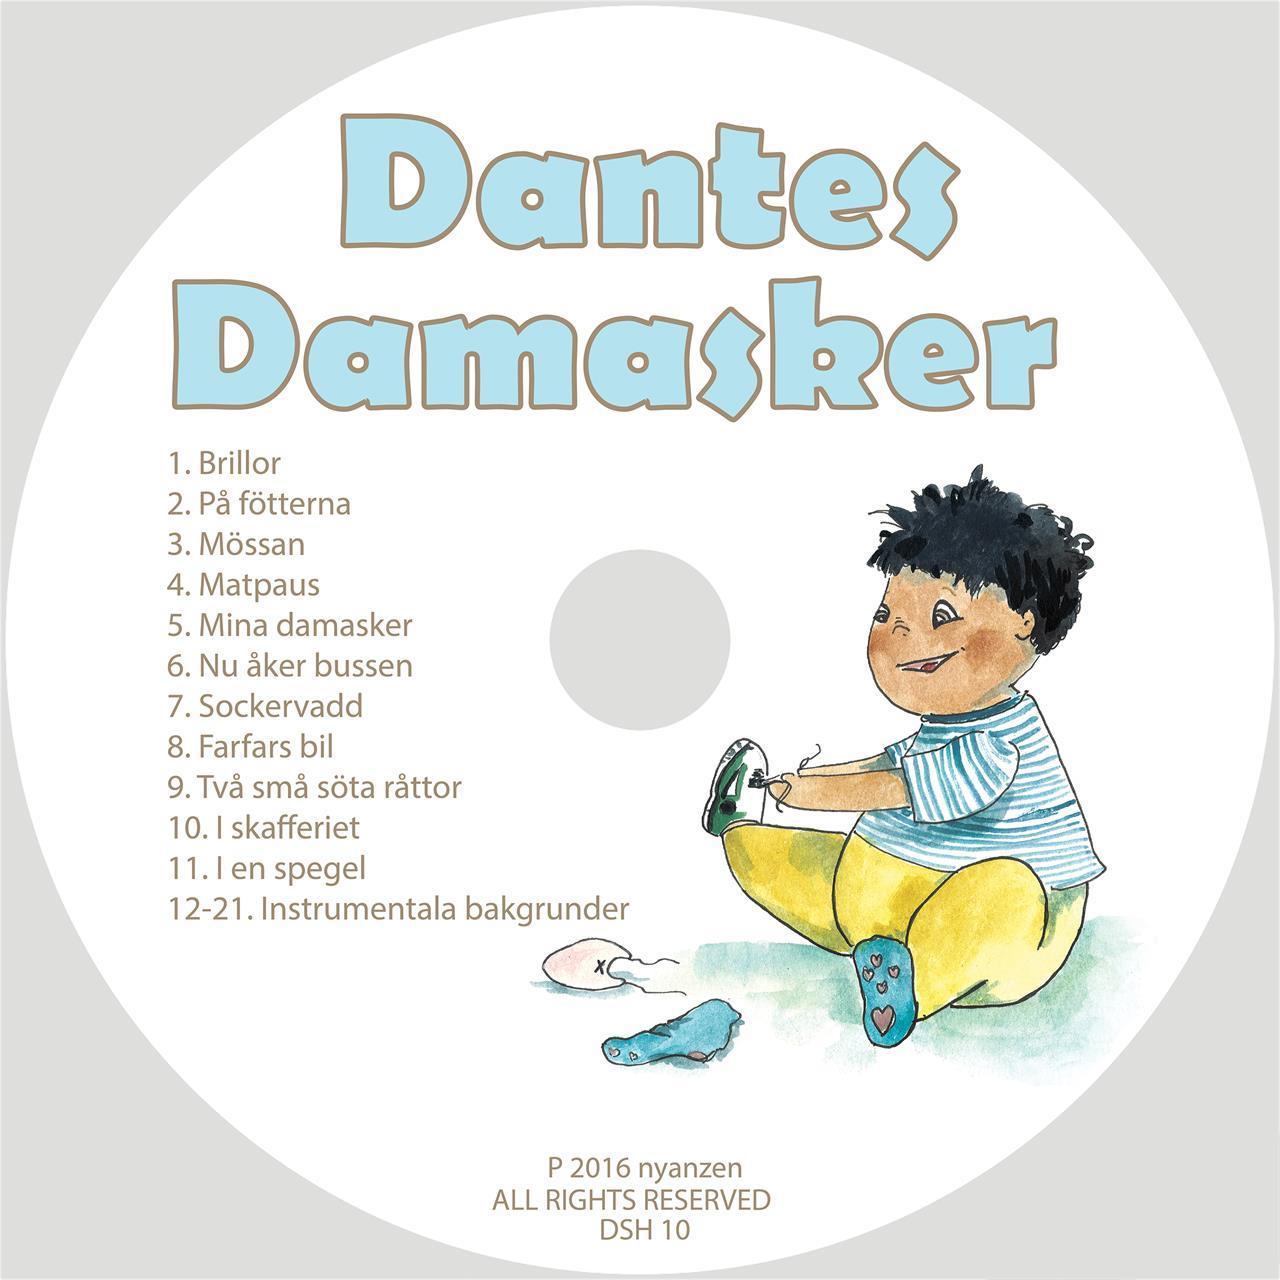 Dantes Damasker - Cd/Digital musik